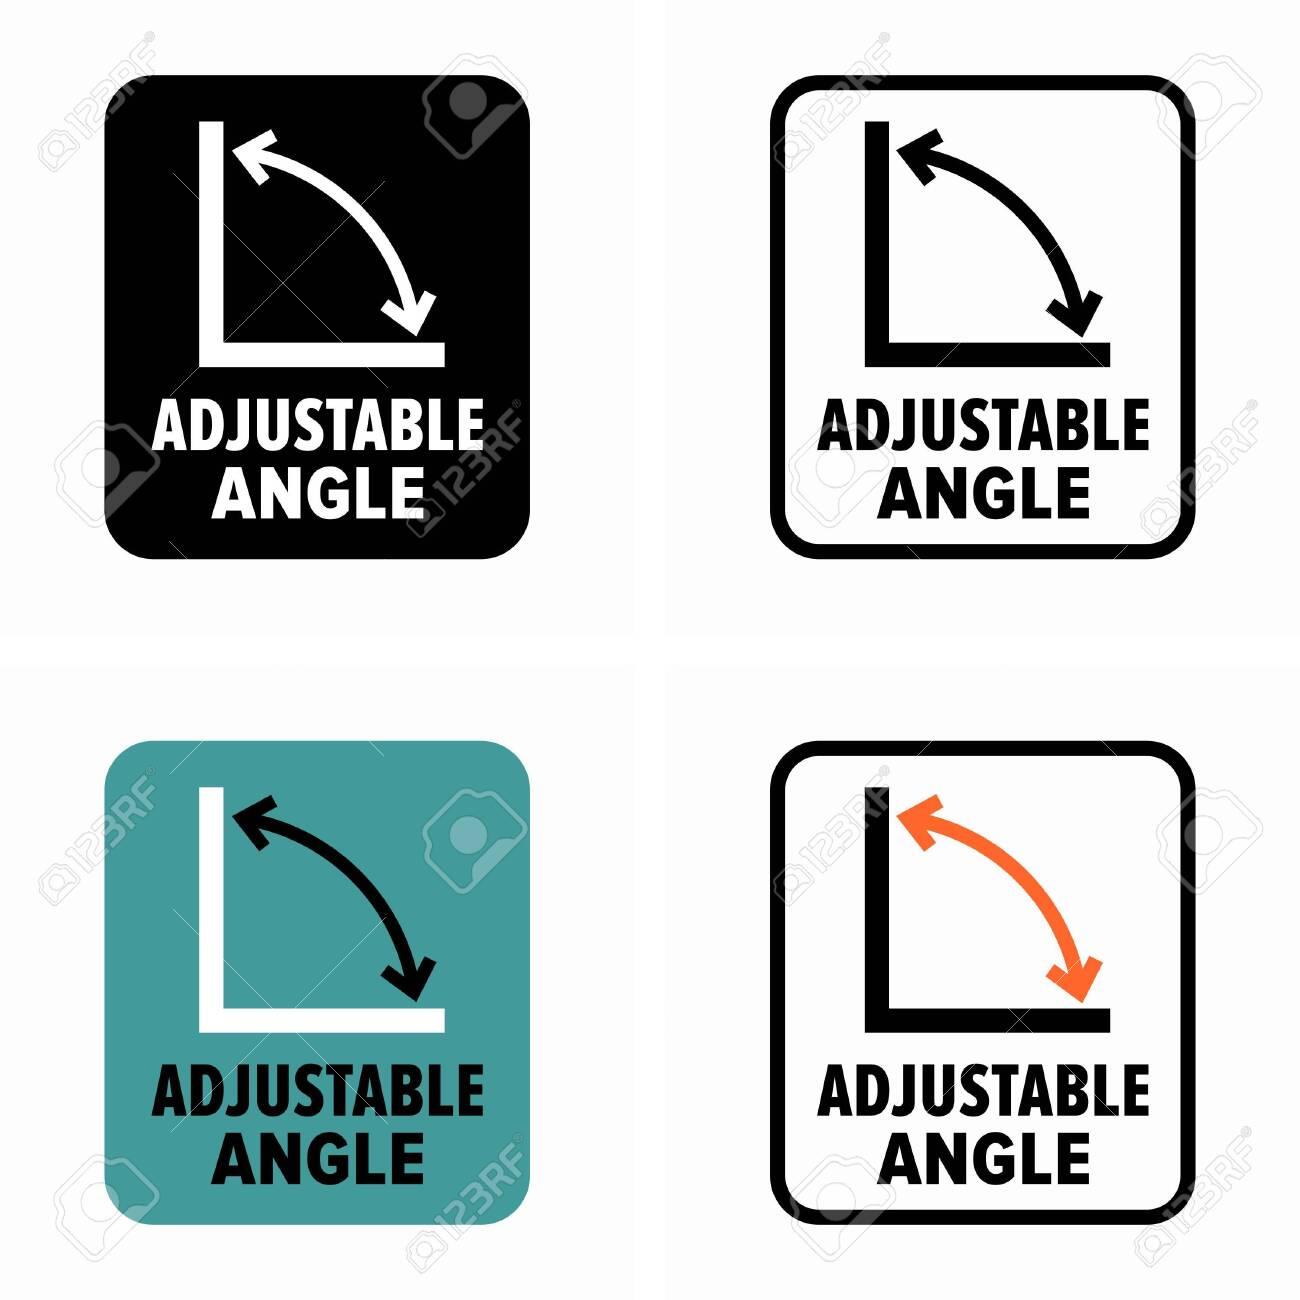 Adjustable angle recline information sign - 141547371